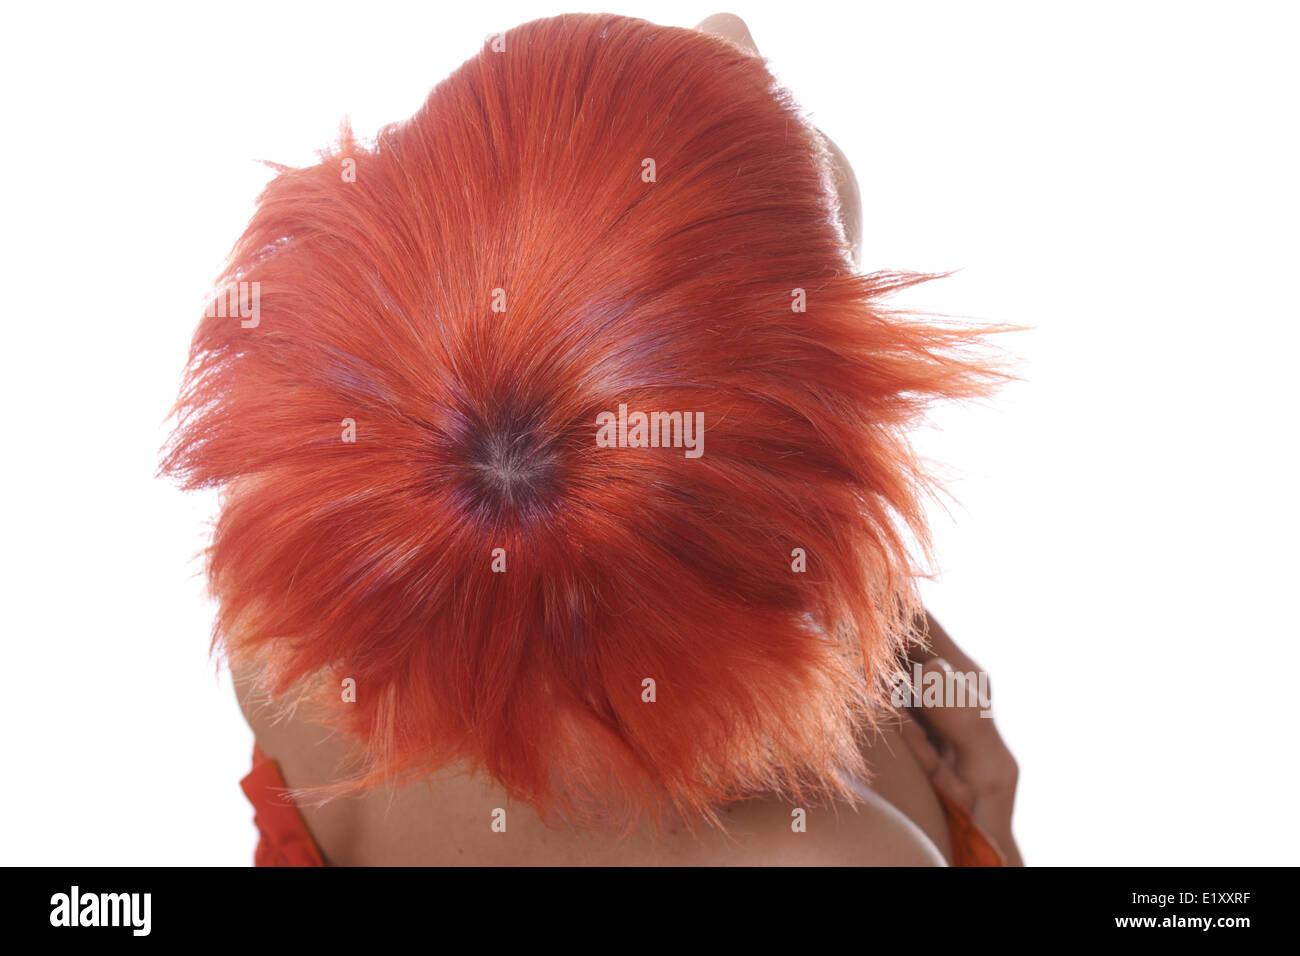 Kurze Rote Haare Stockfoto Bild 70047923 Alamy